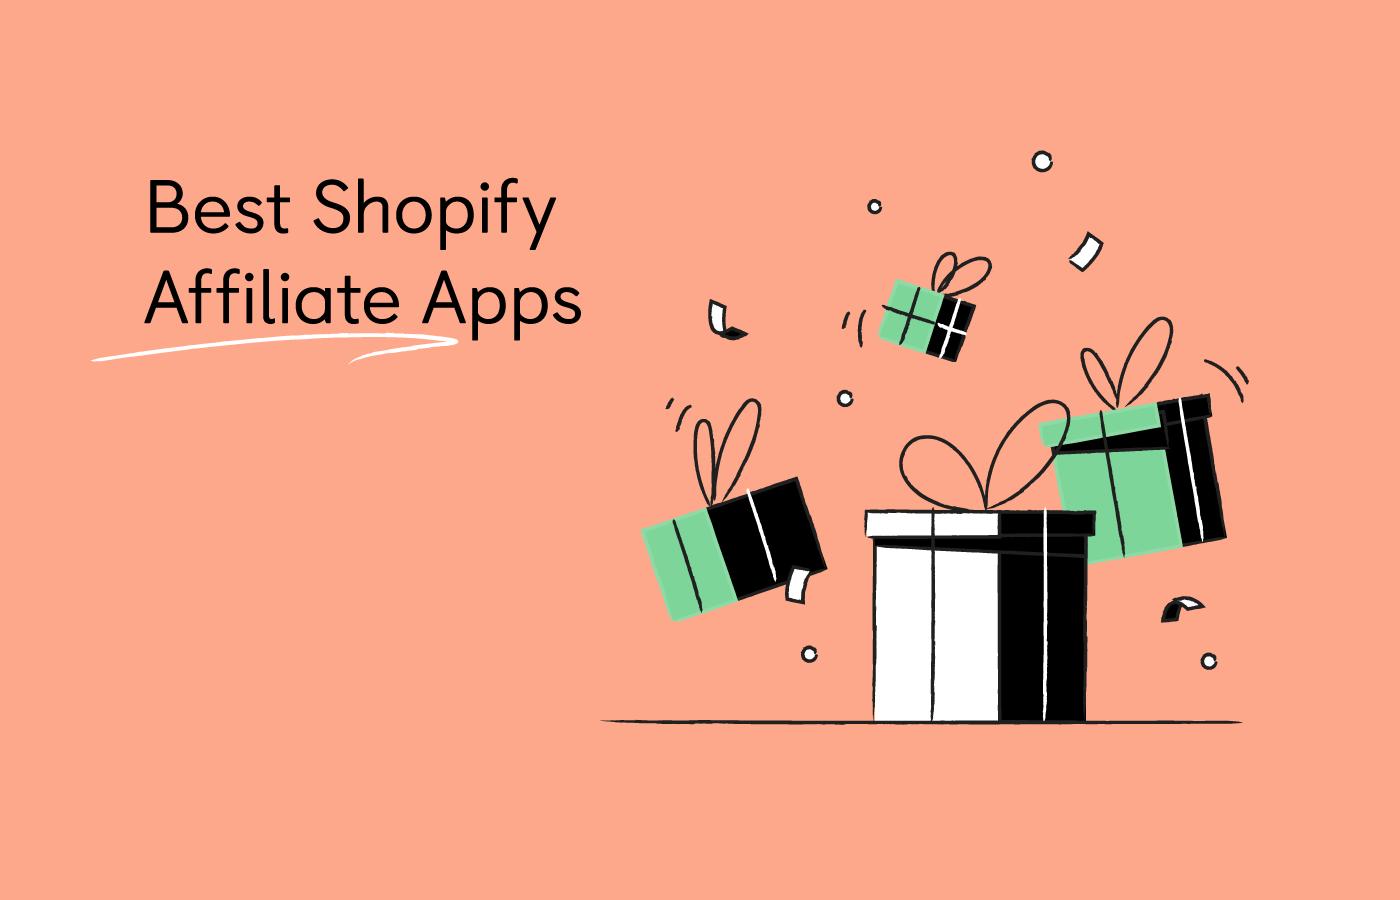 10 Best Shopify Affiliate App Options [2021]